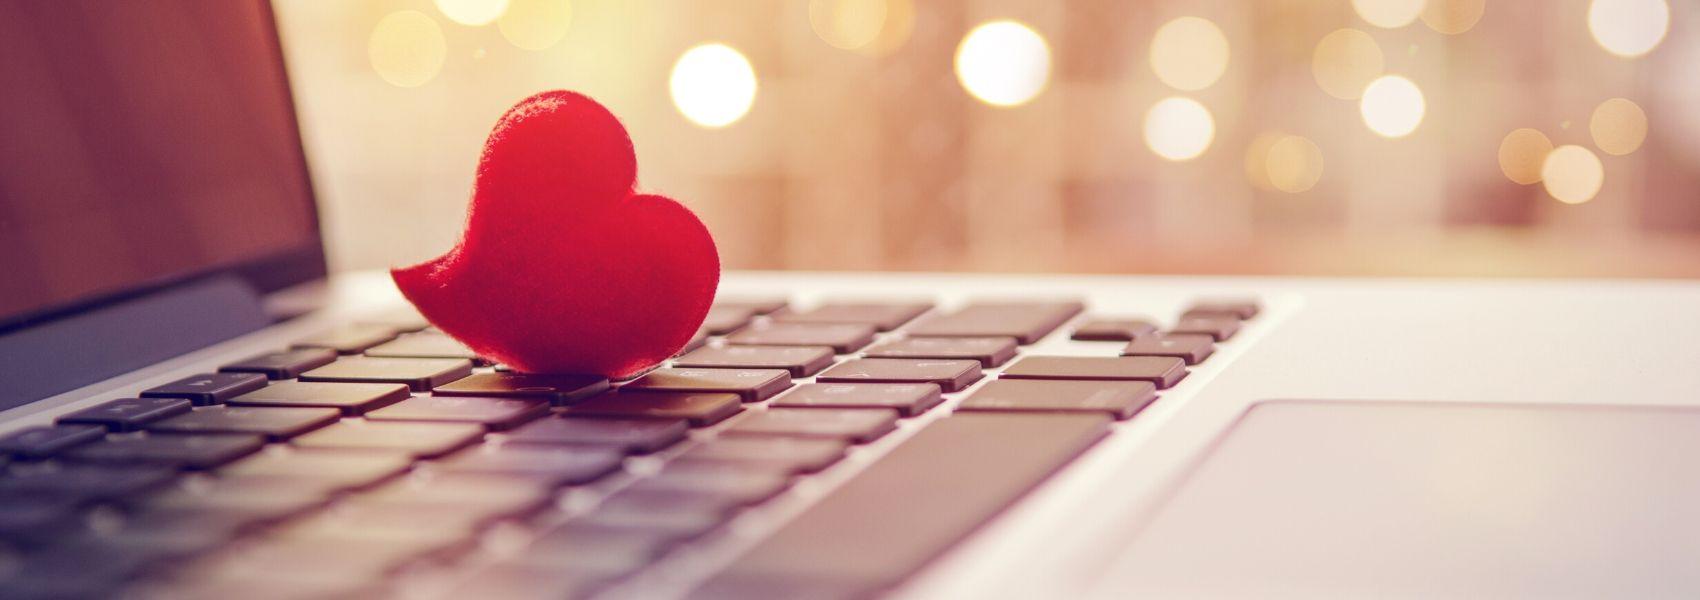 Até 2037, metade dos bebés será fruto de namoros online